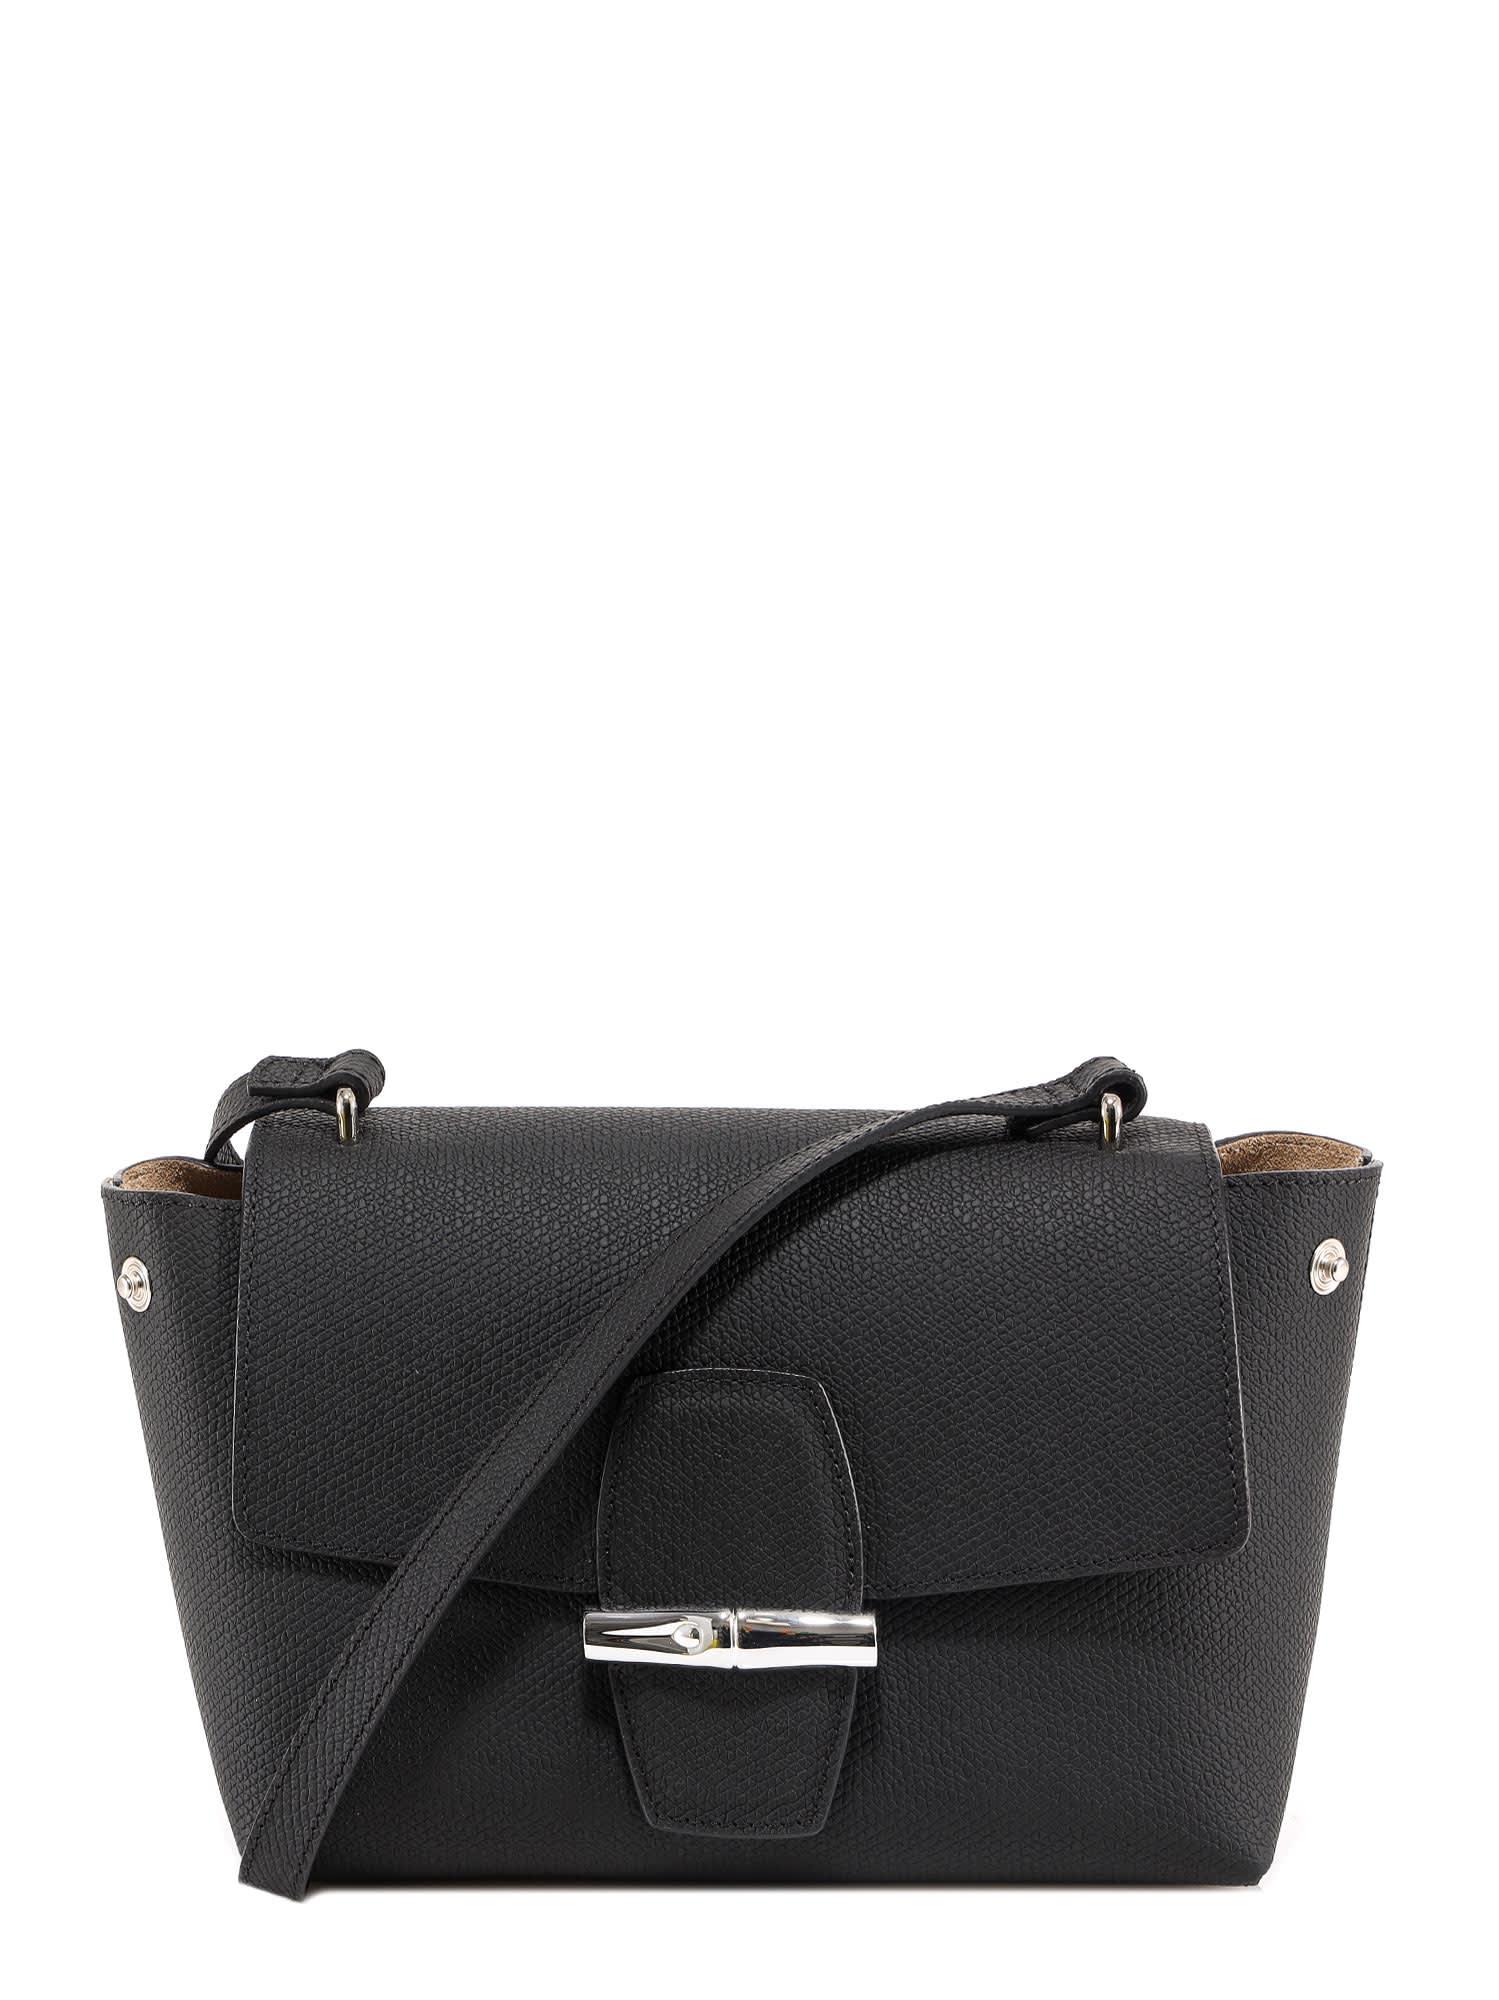 Longchamp Leathers ROSEAU SHOULDER BAG